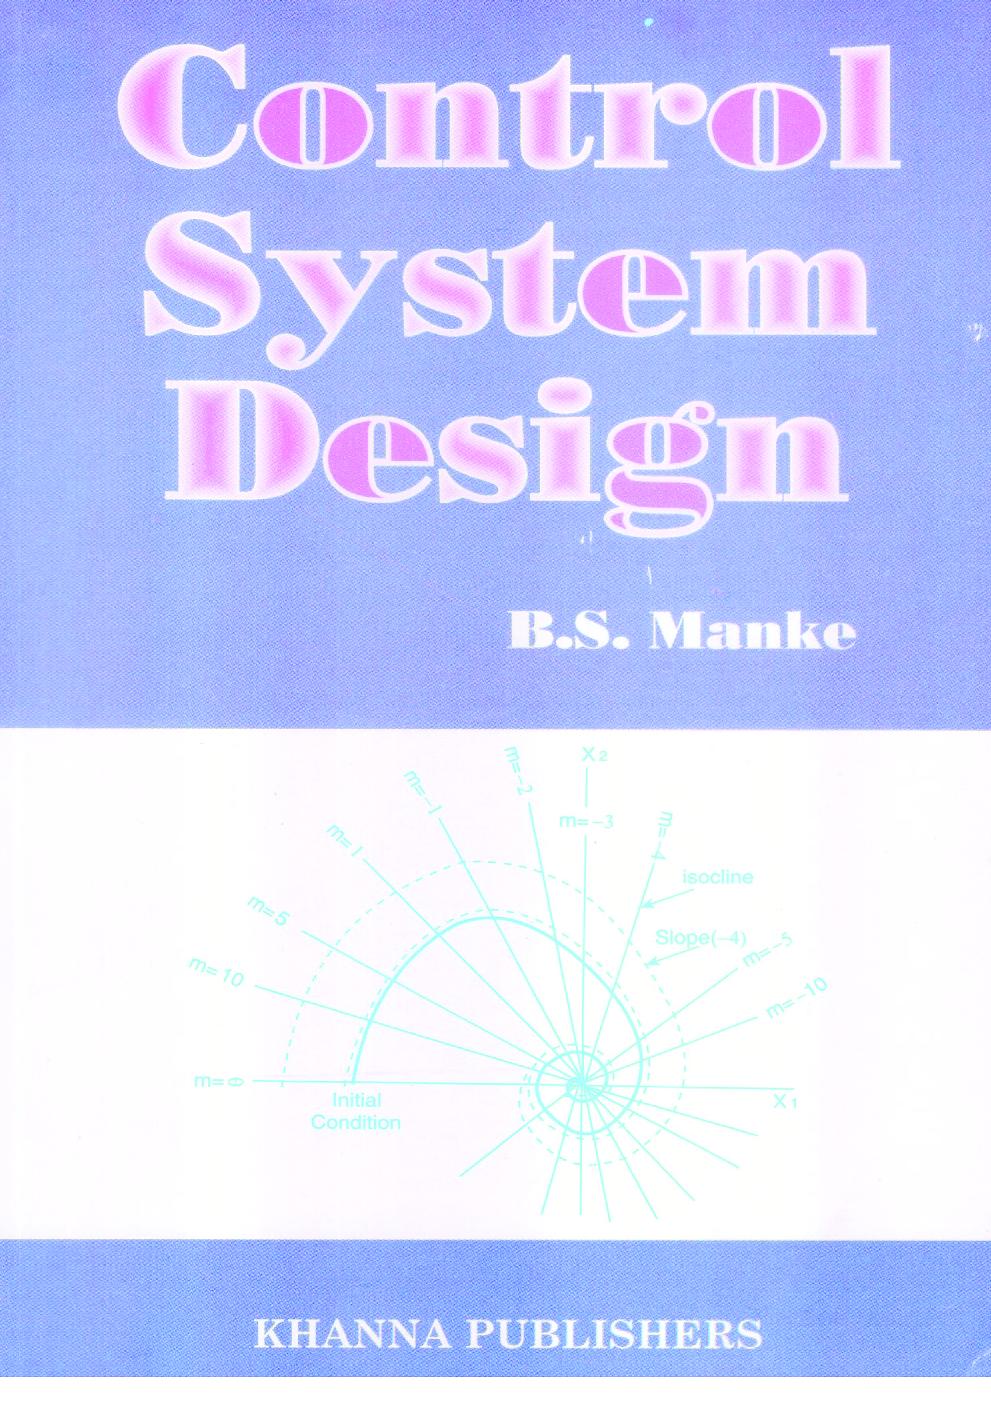 control system engineering pdf by manke